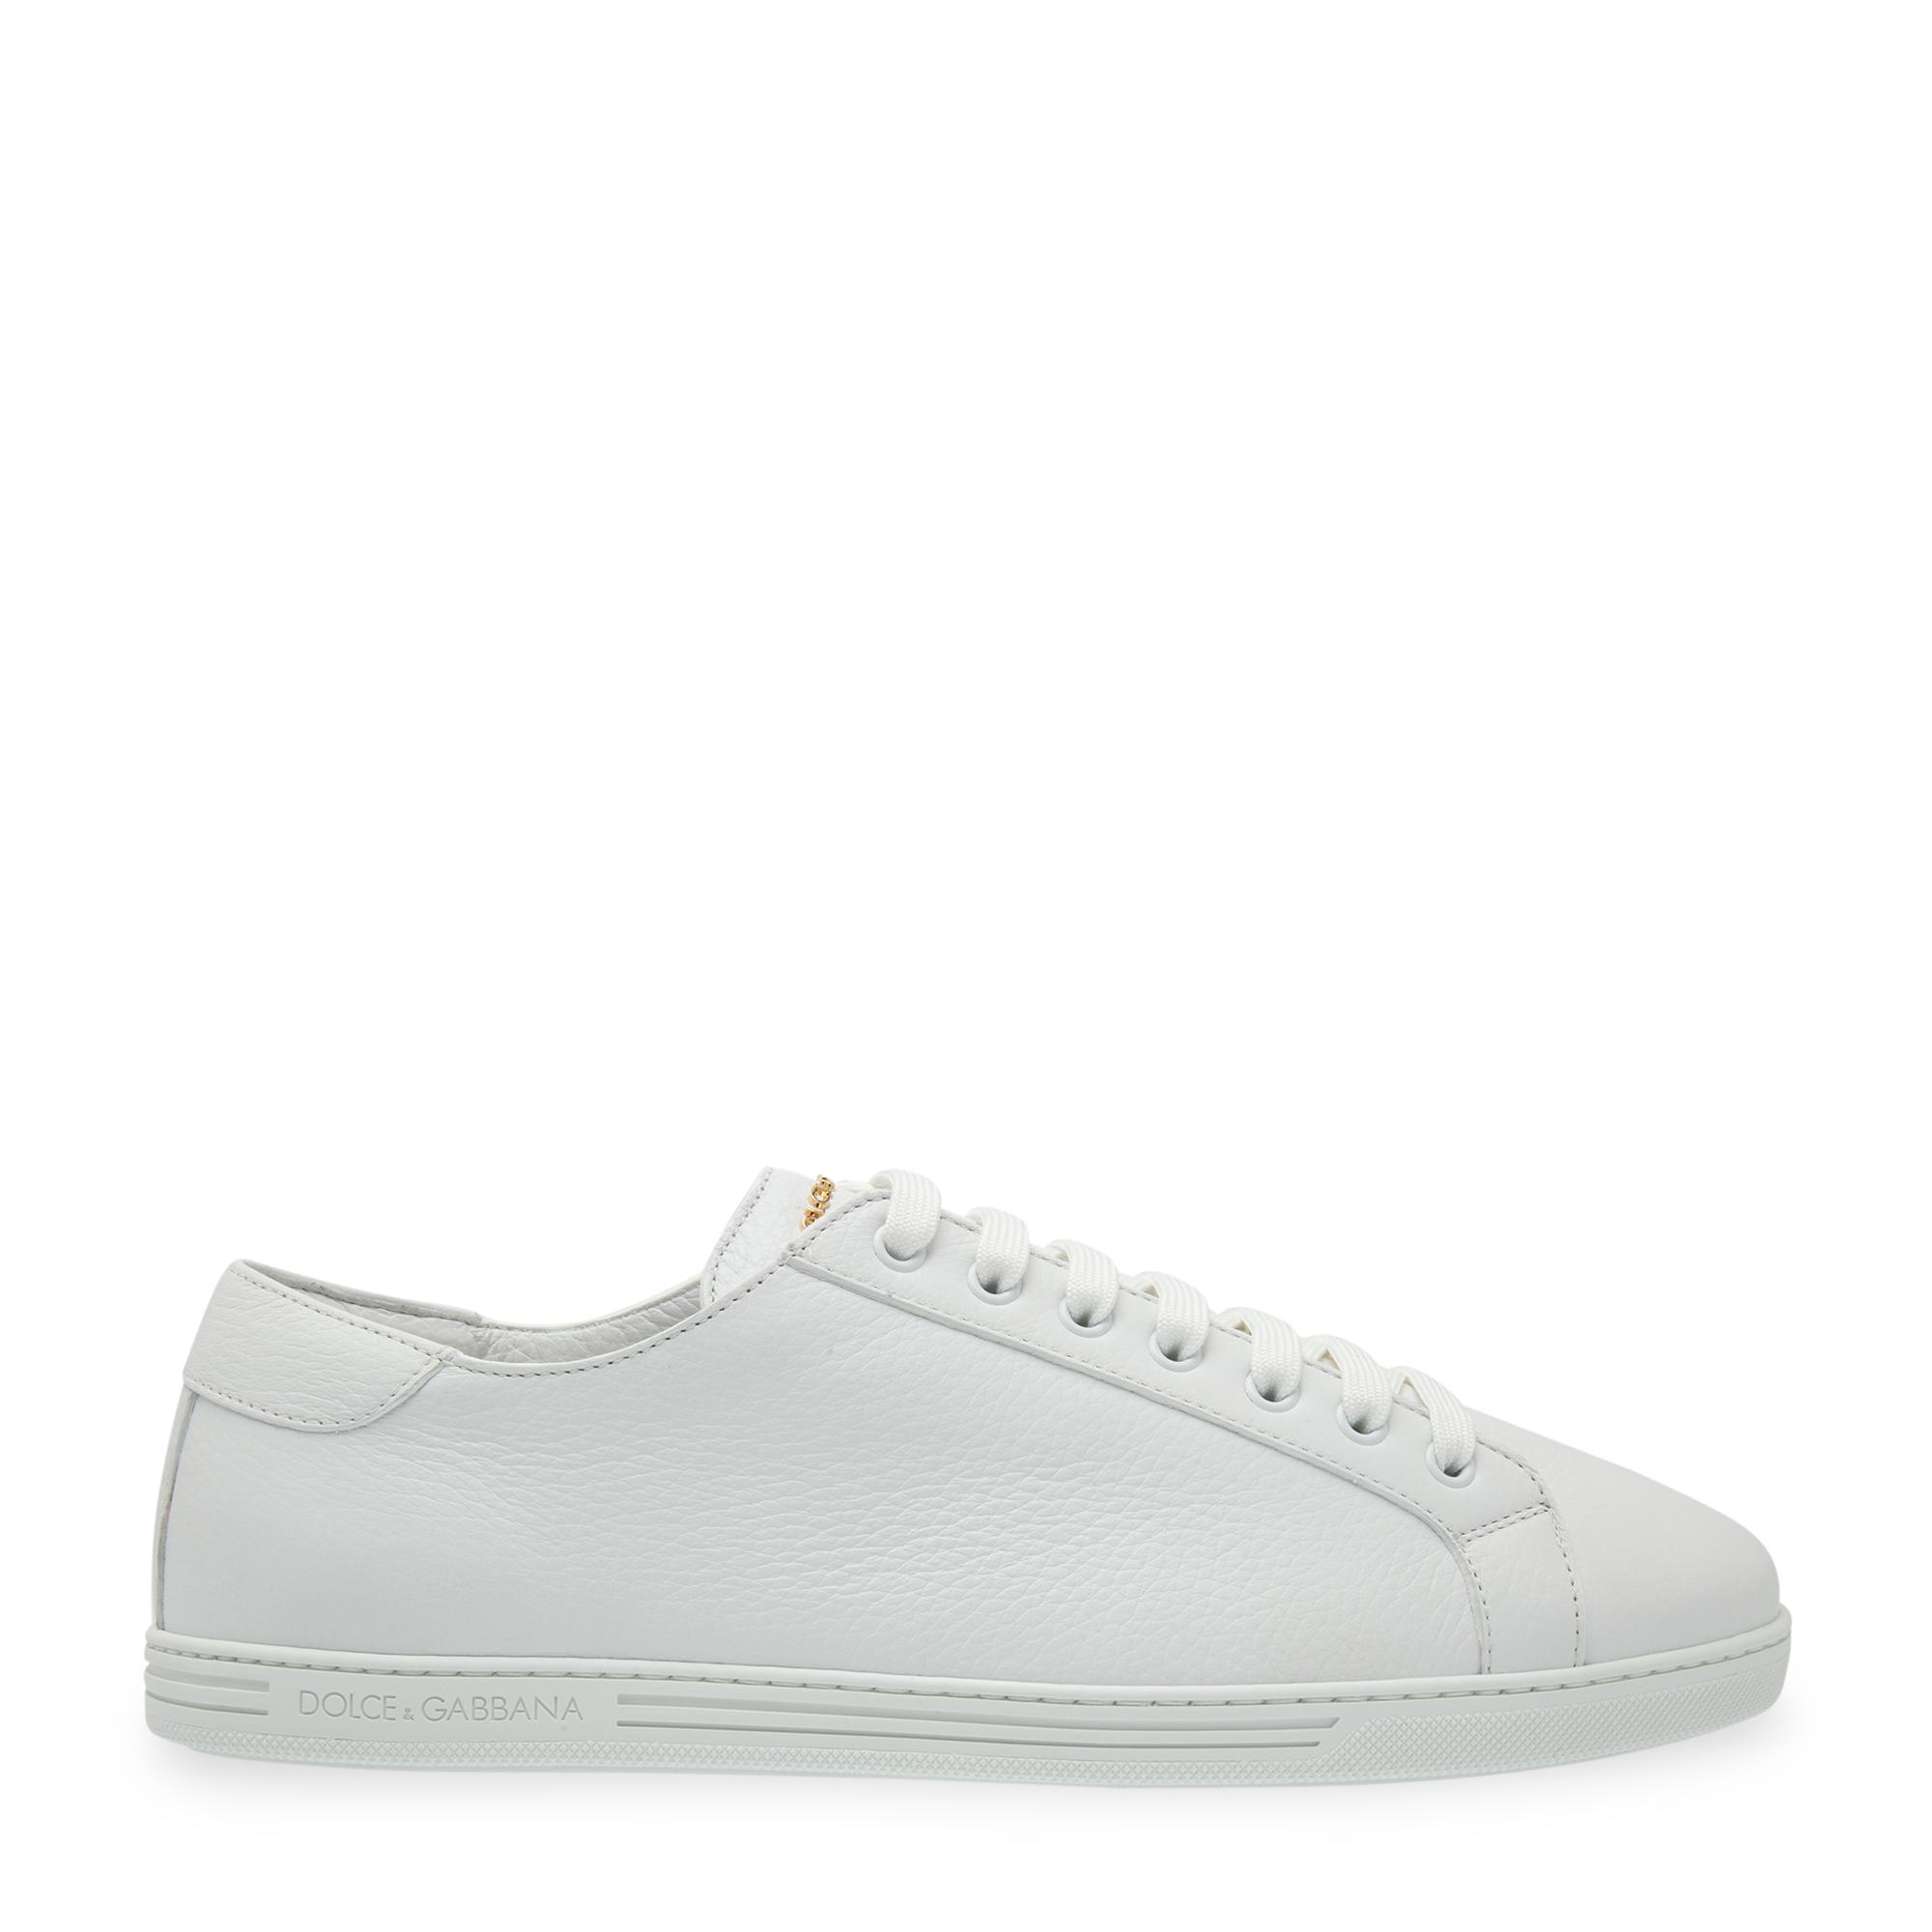 Saint Tropez sneakers